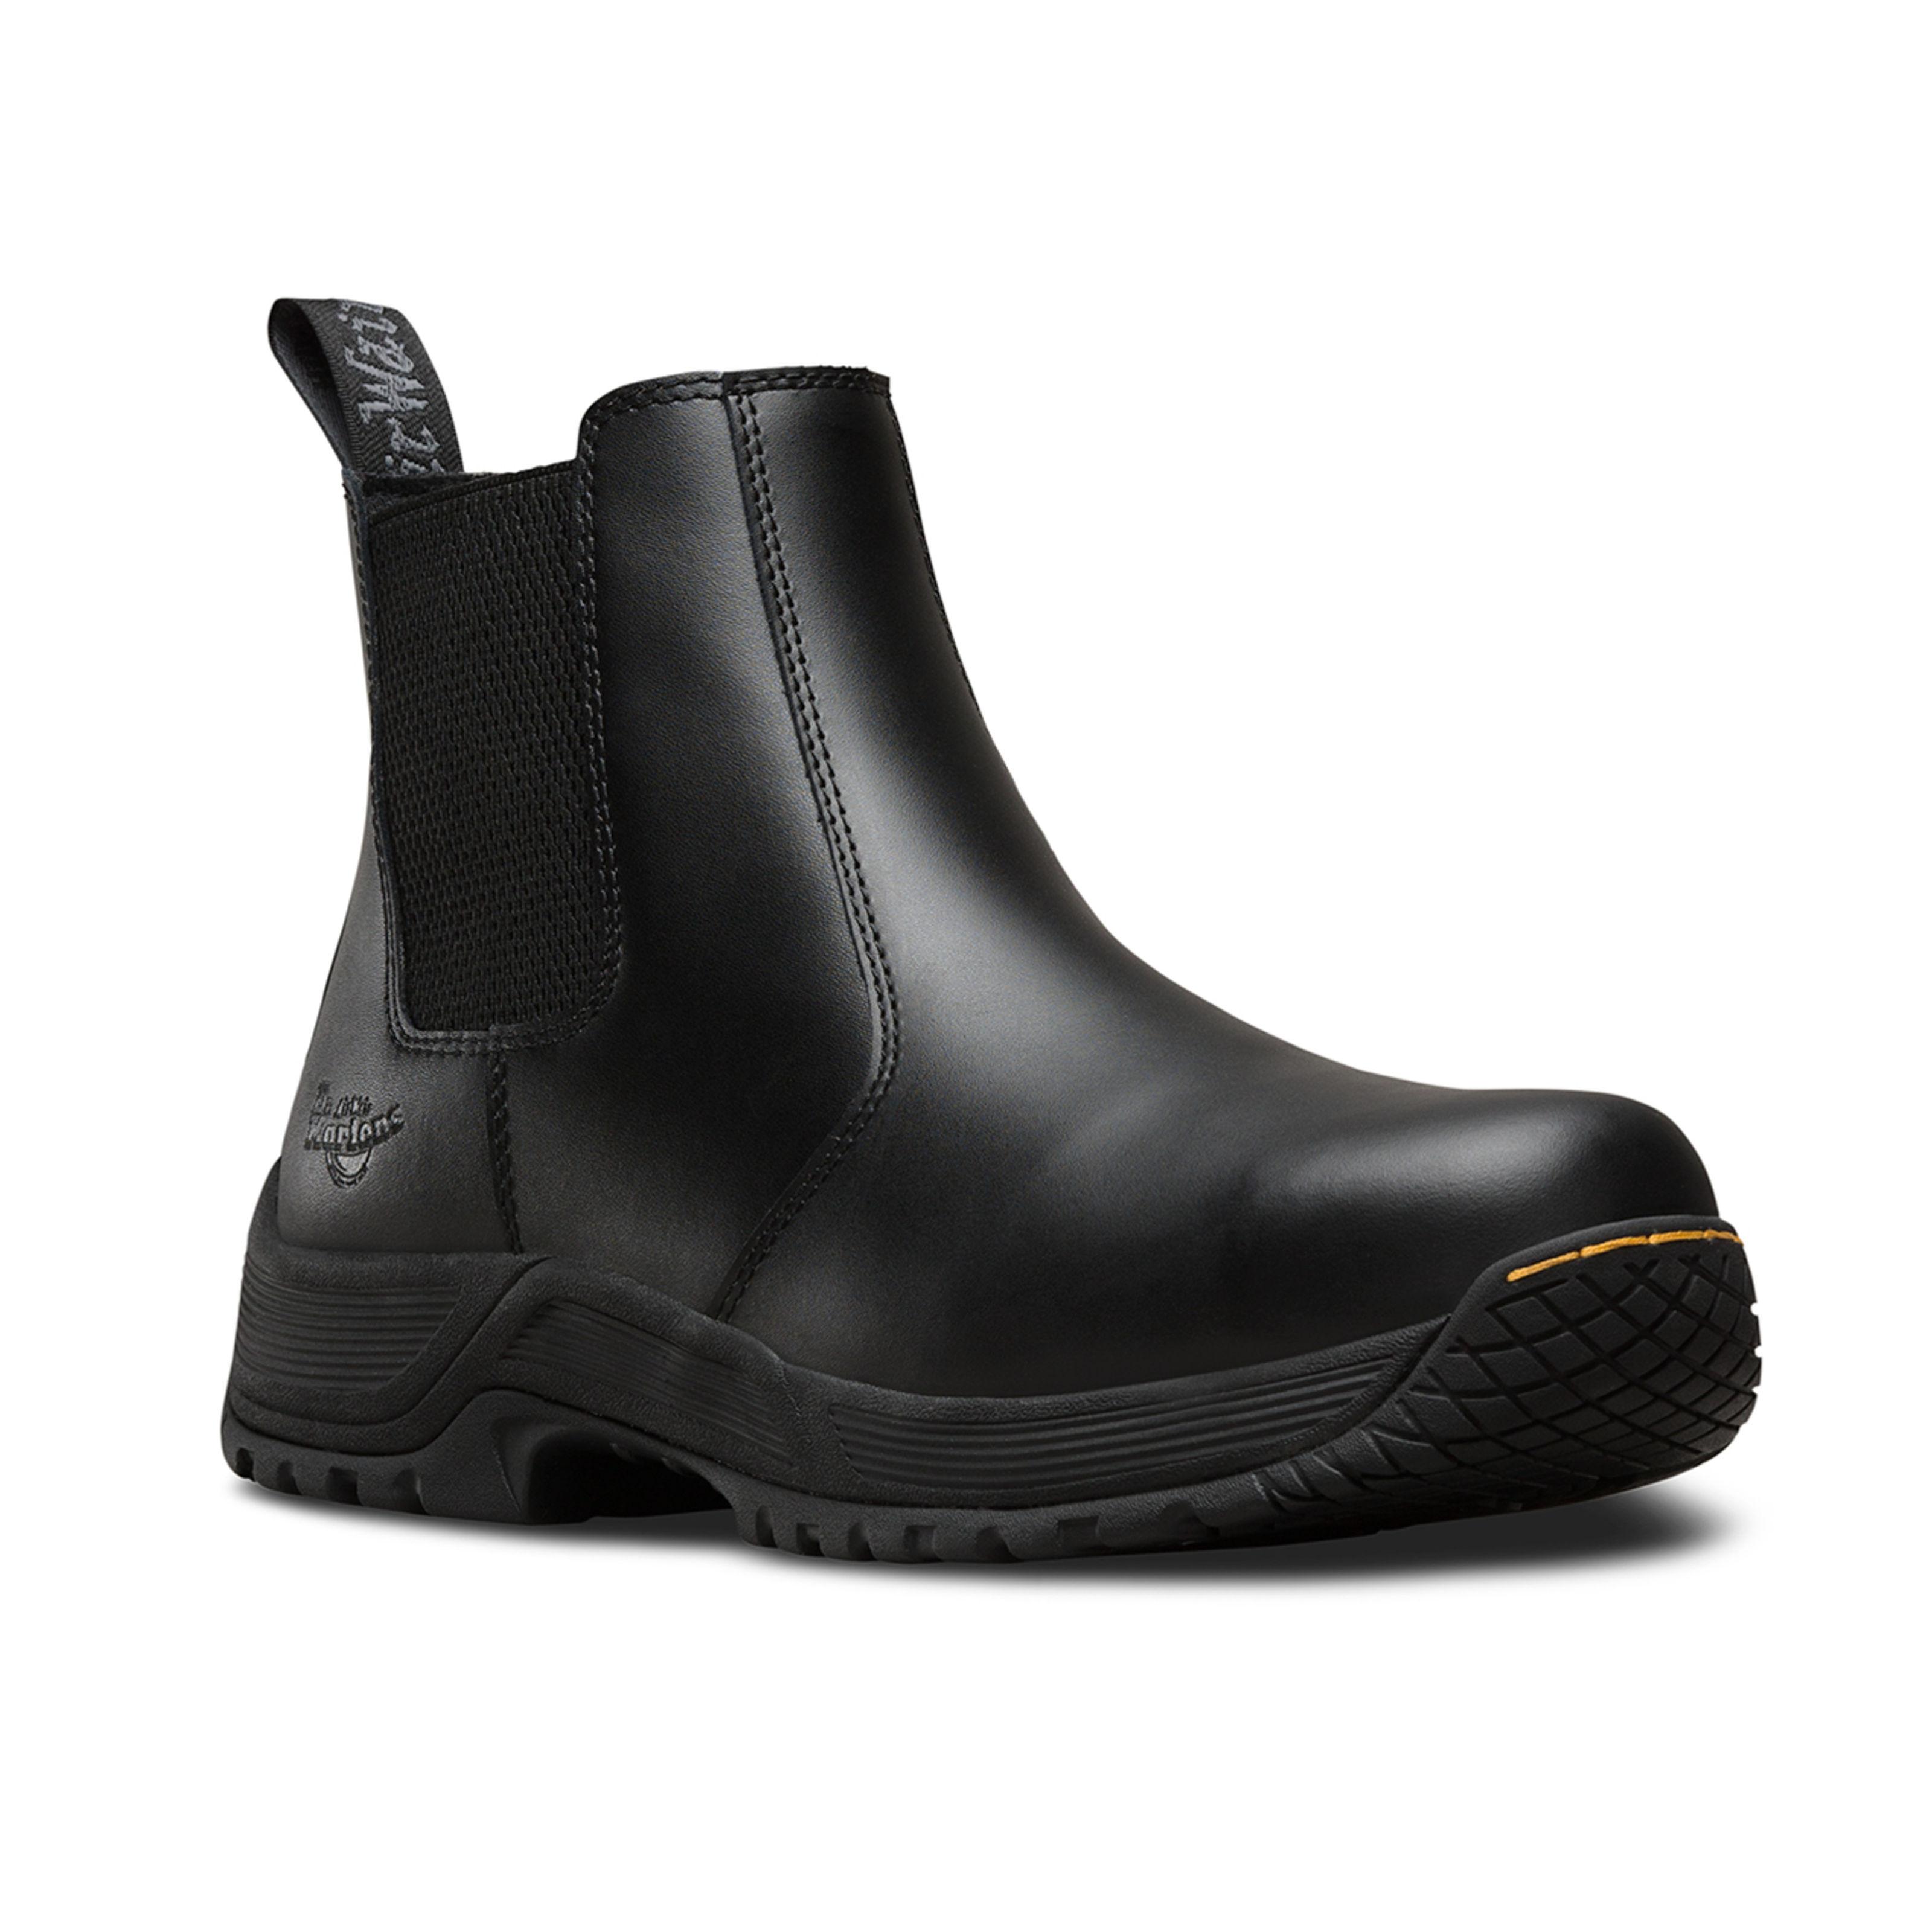 dr martens steel toe boots near me